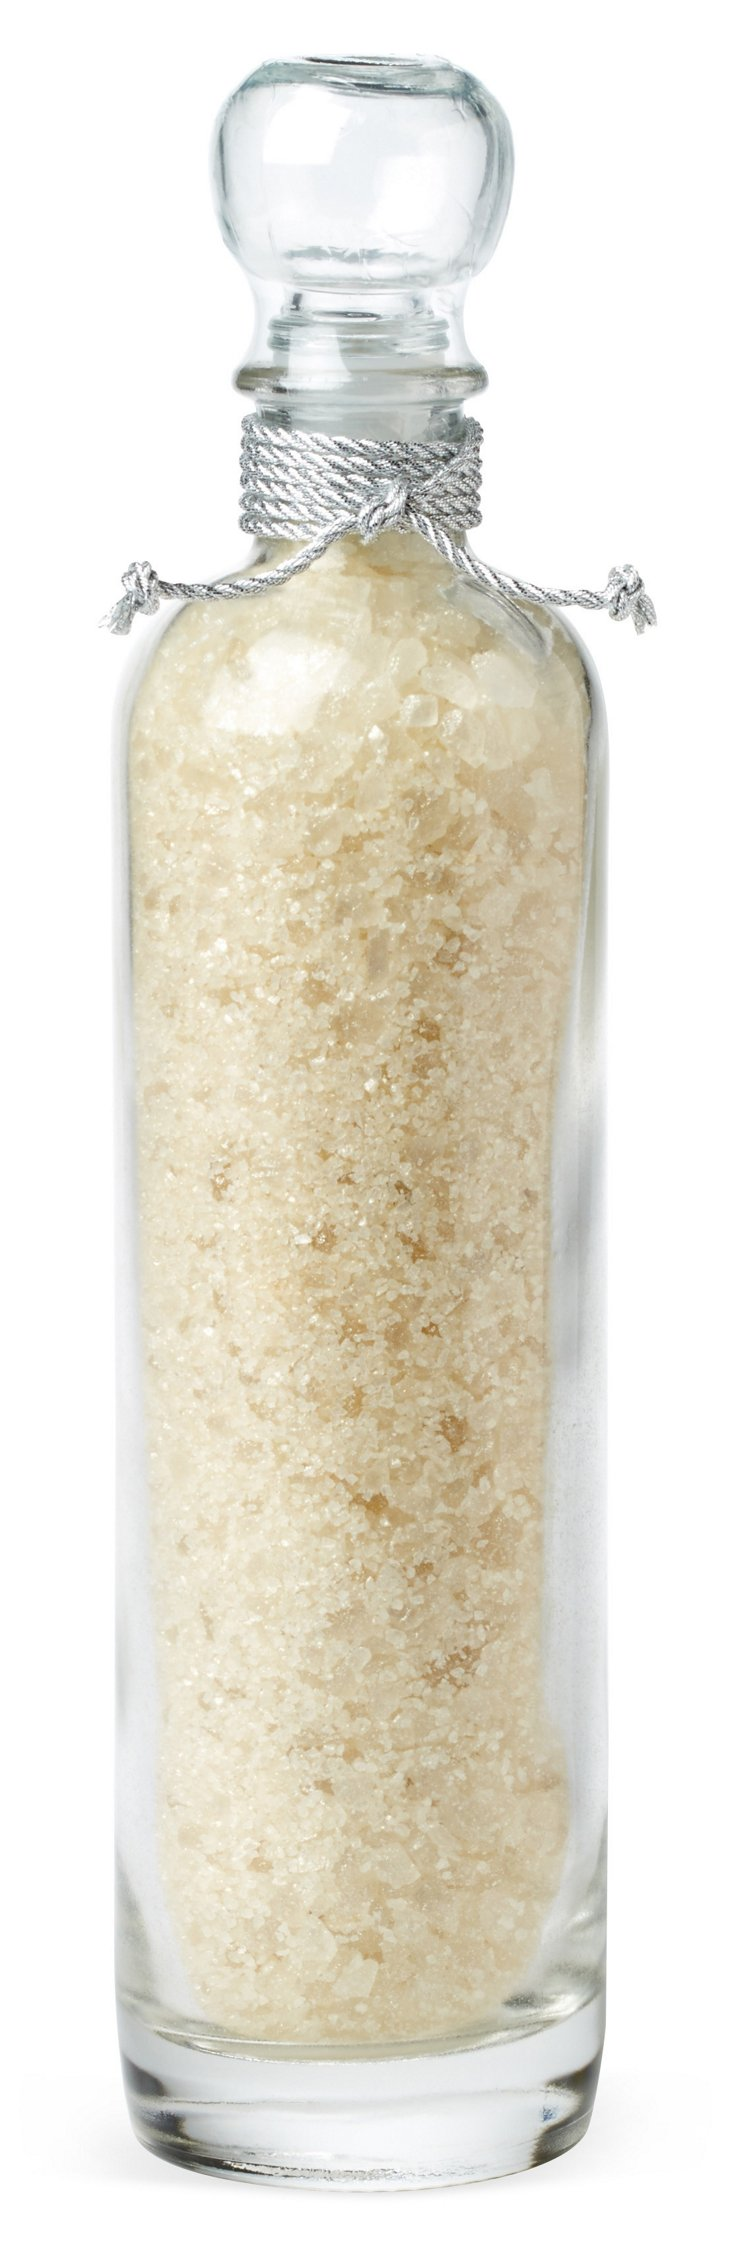 Tall Decanter Bath Salts,  Tryst